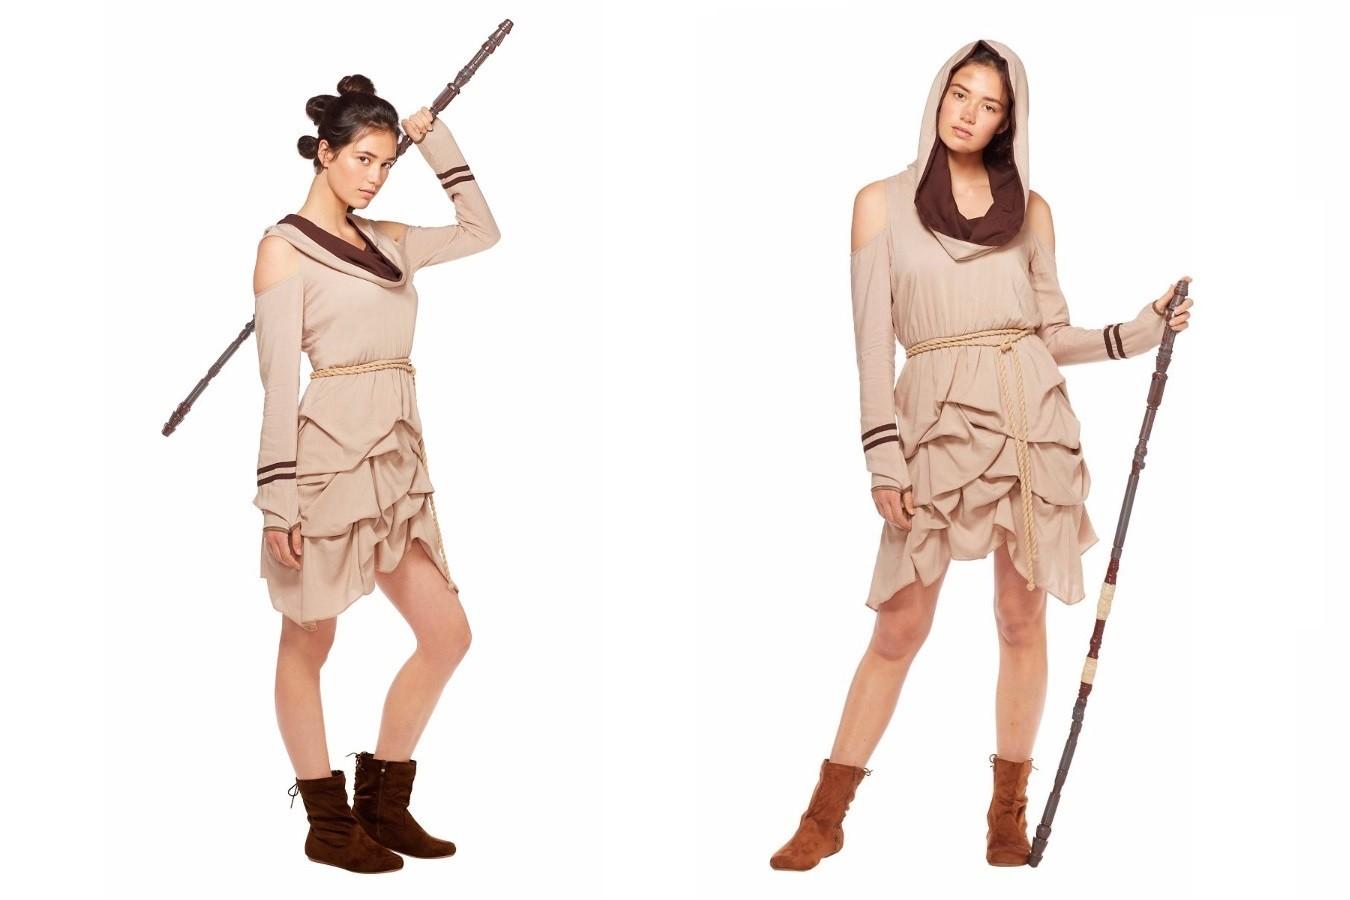 Rey inspired dress at Spirit Halloween